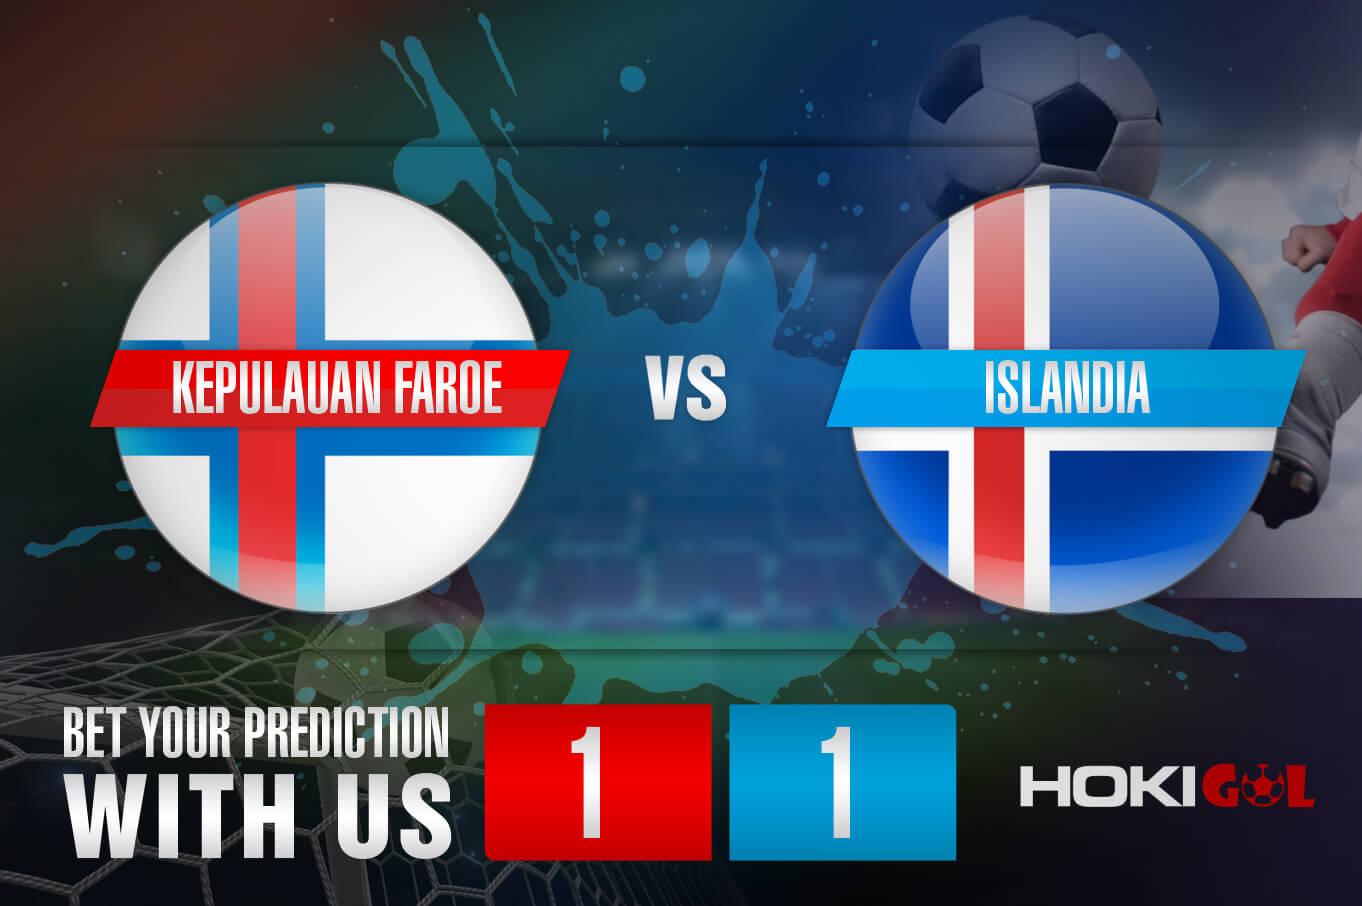 Prediksi Bola Kepulauan Faroe Vs Islandia 5 Juni 2021